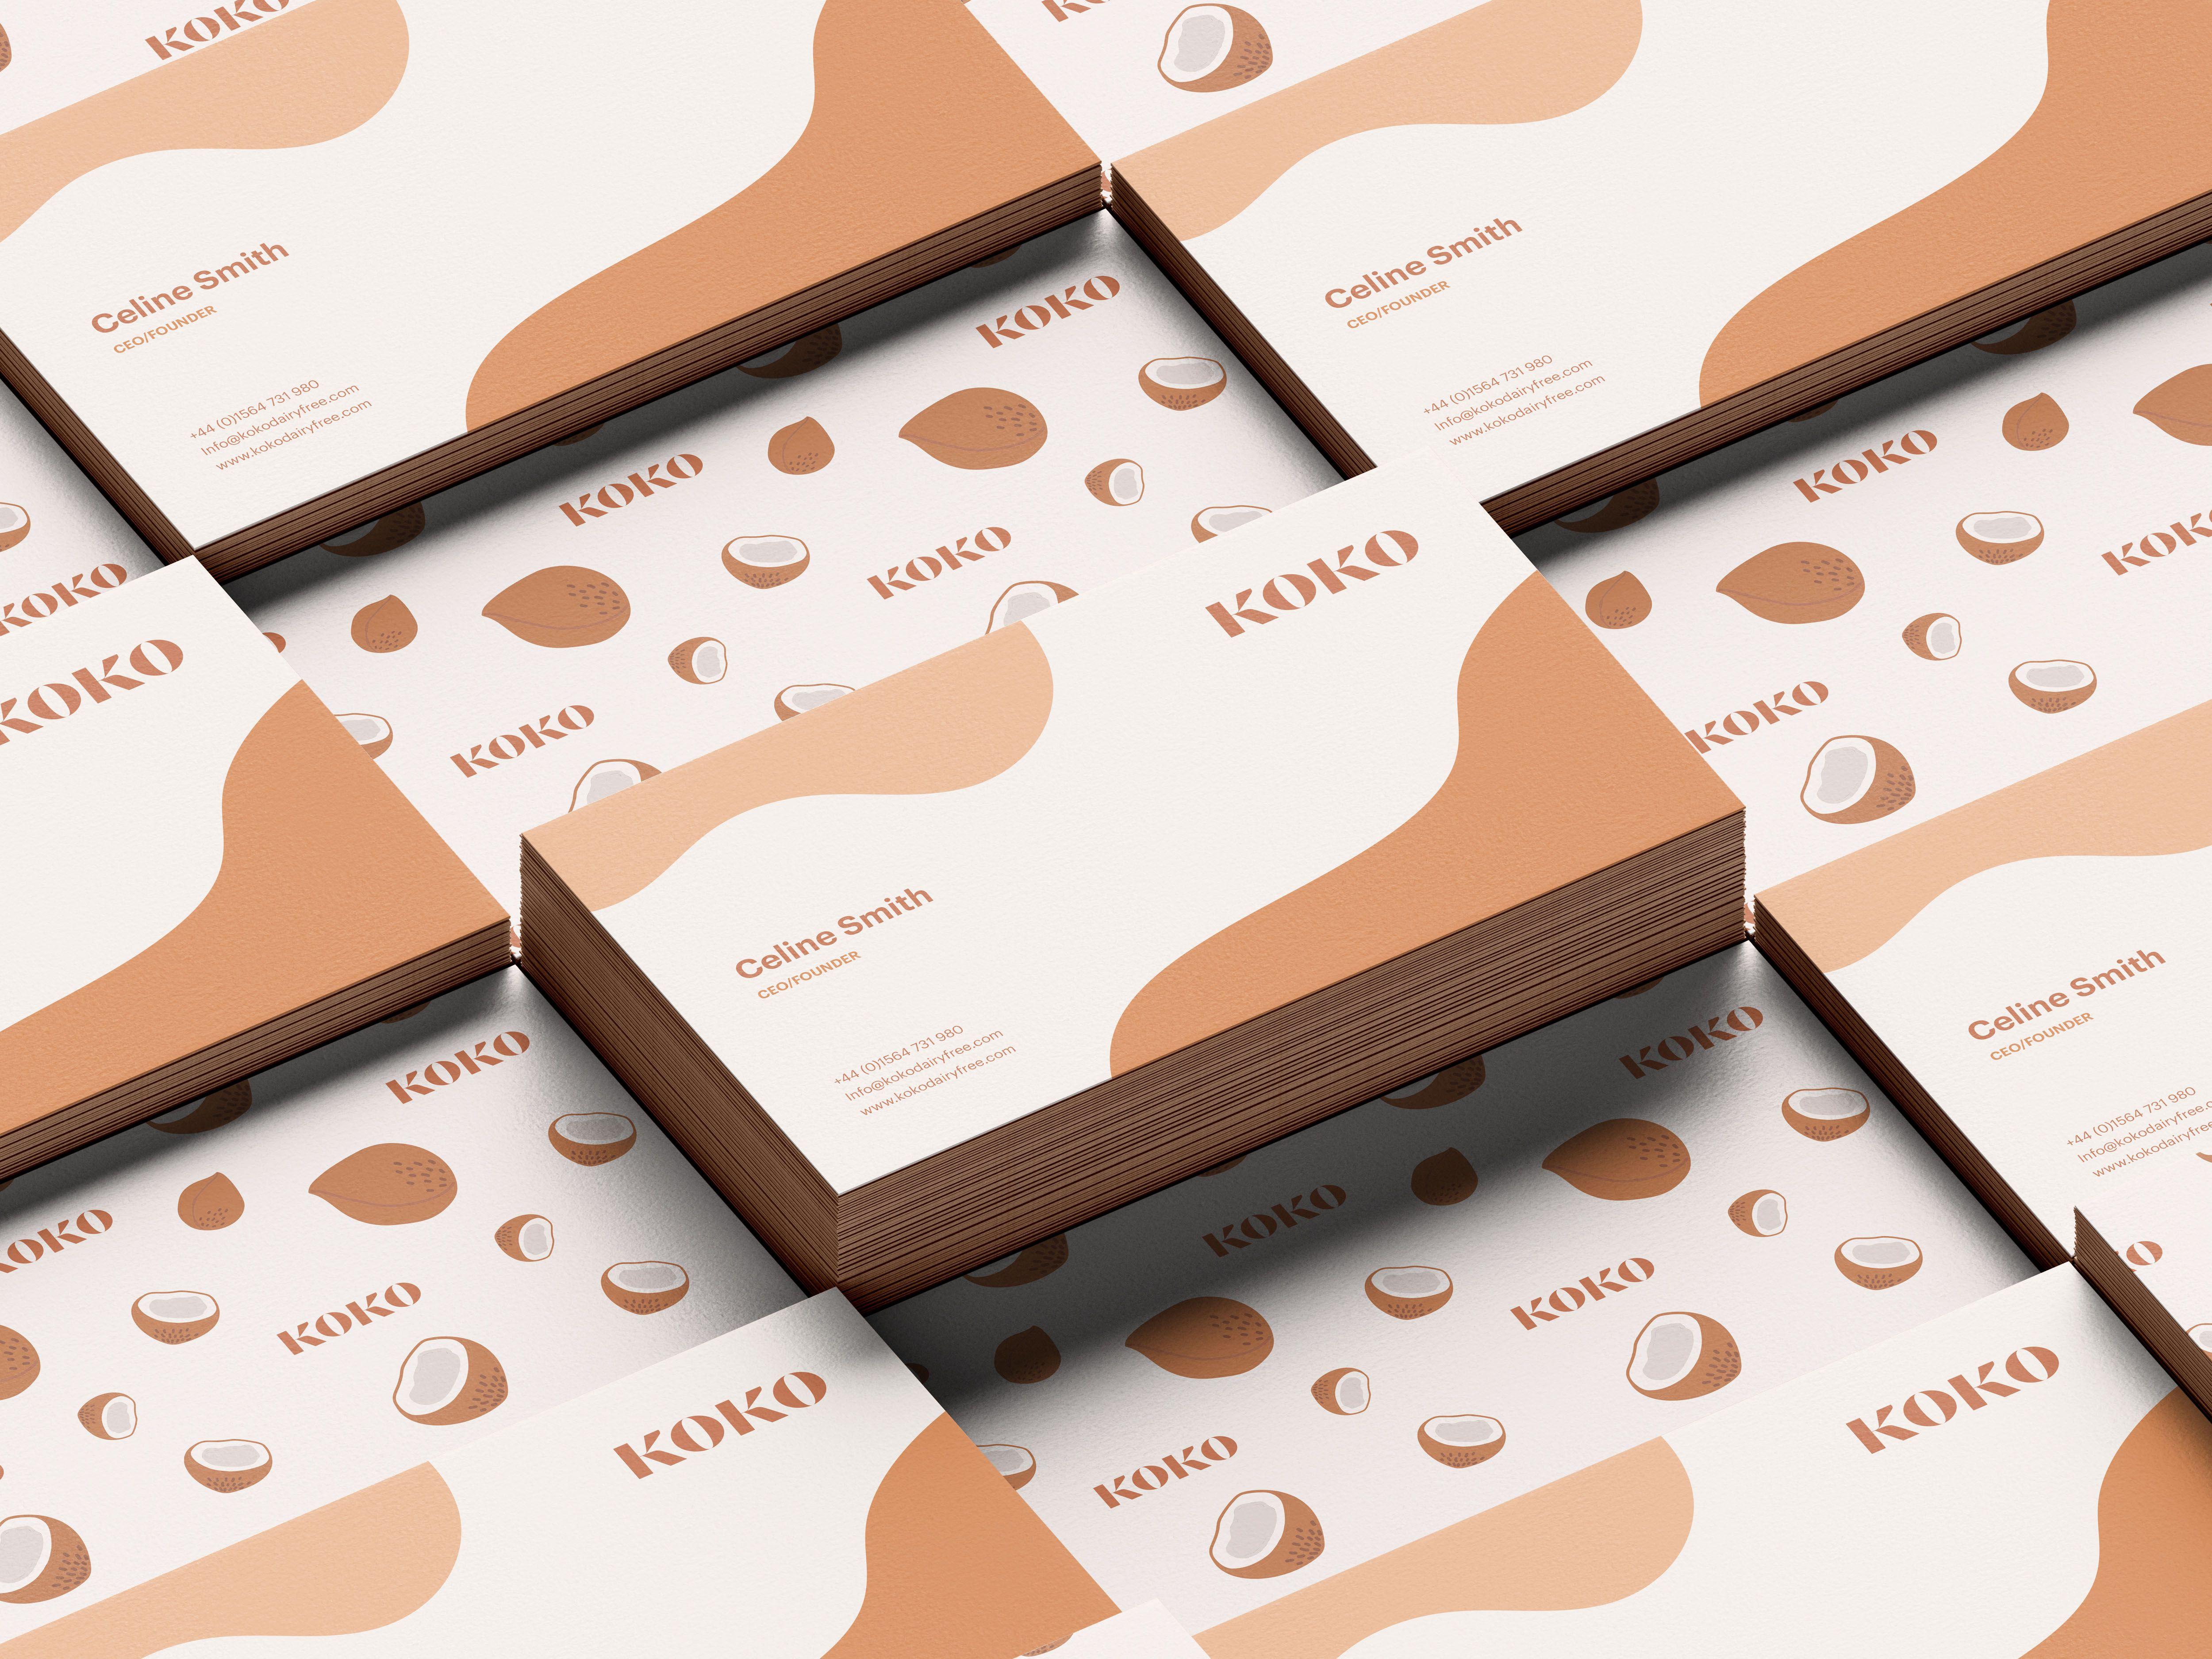 Koko Business Card Business Card Design Inspiration Business Card Design Business Card Inspiration Unique Business Cards